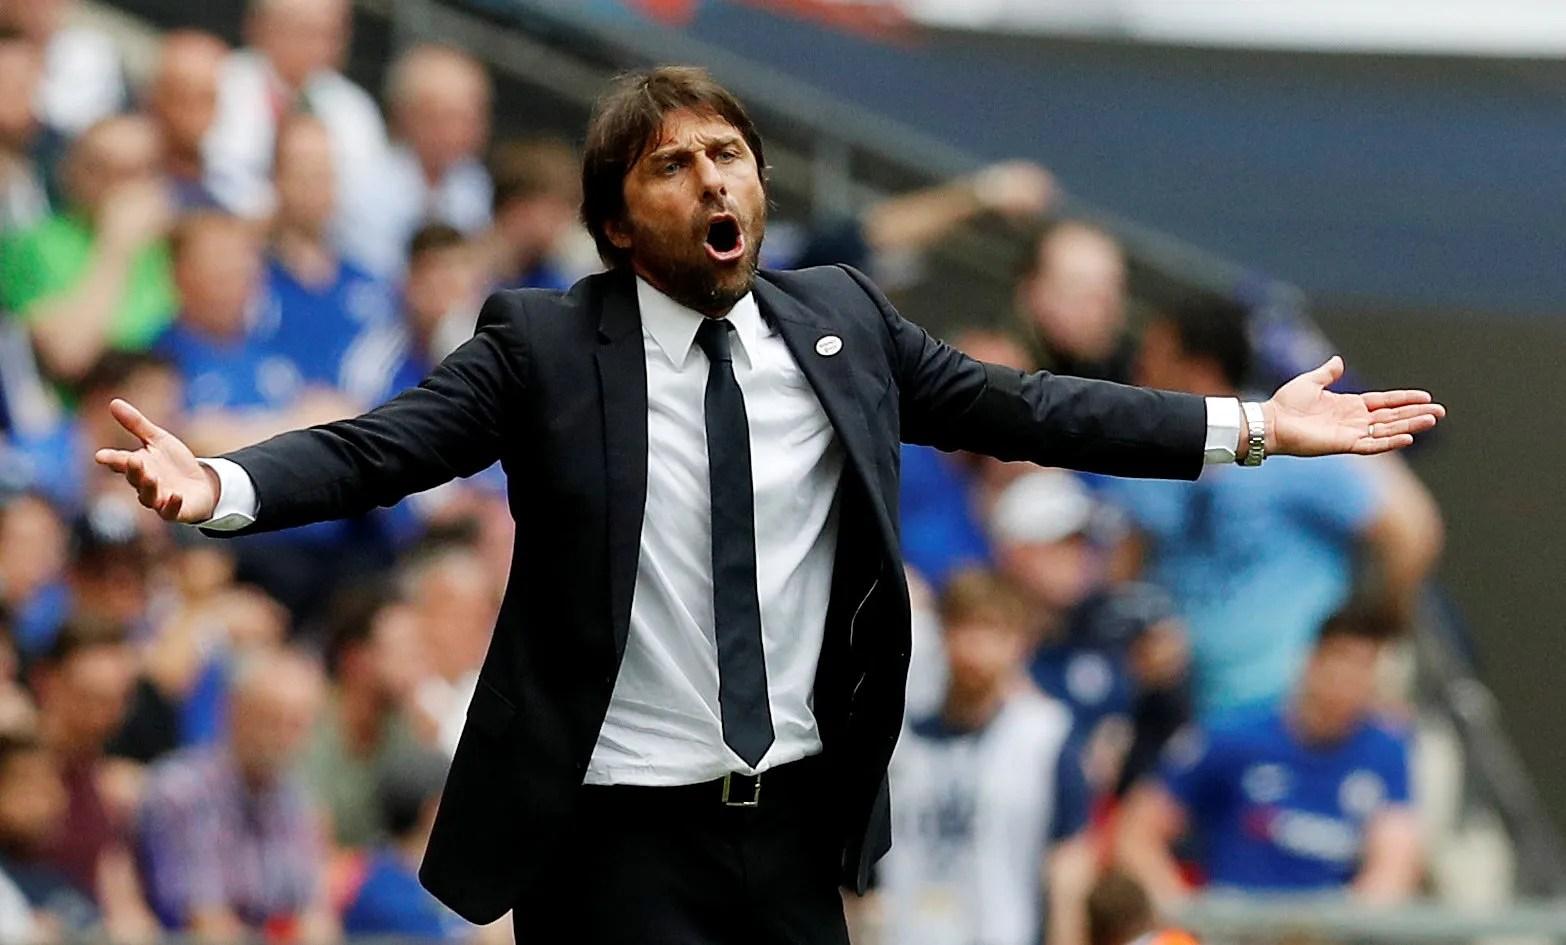 Antonio Conte remonstrates on the touchline